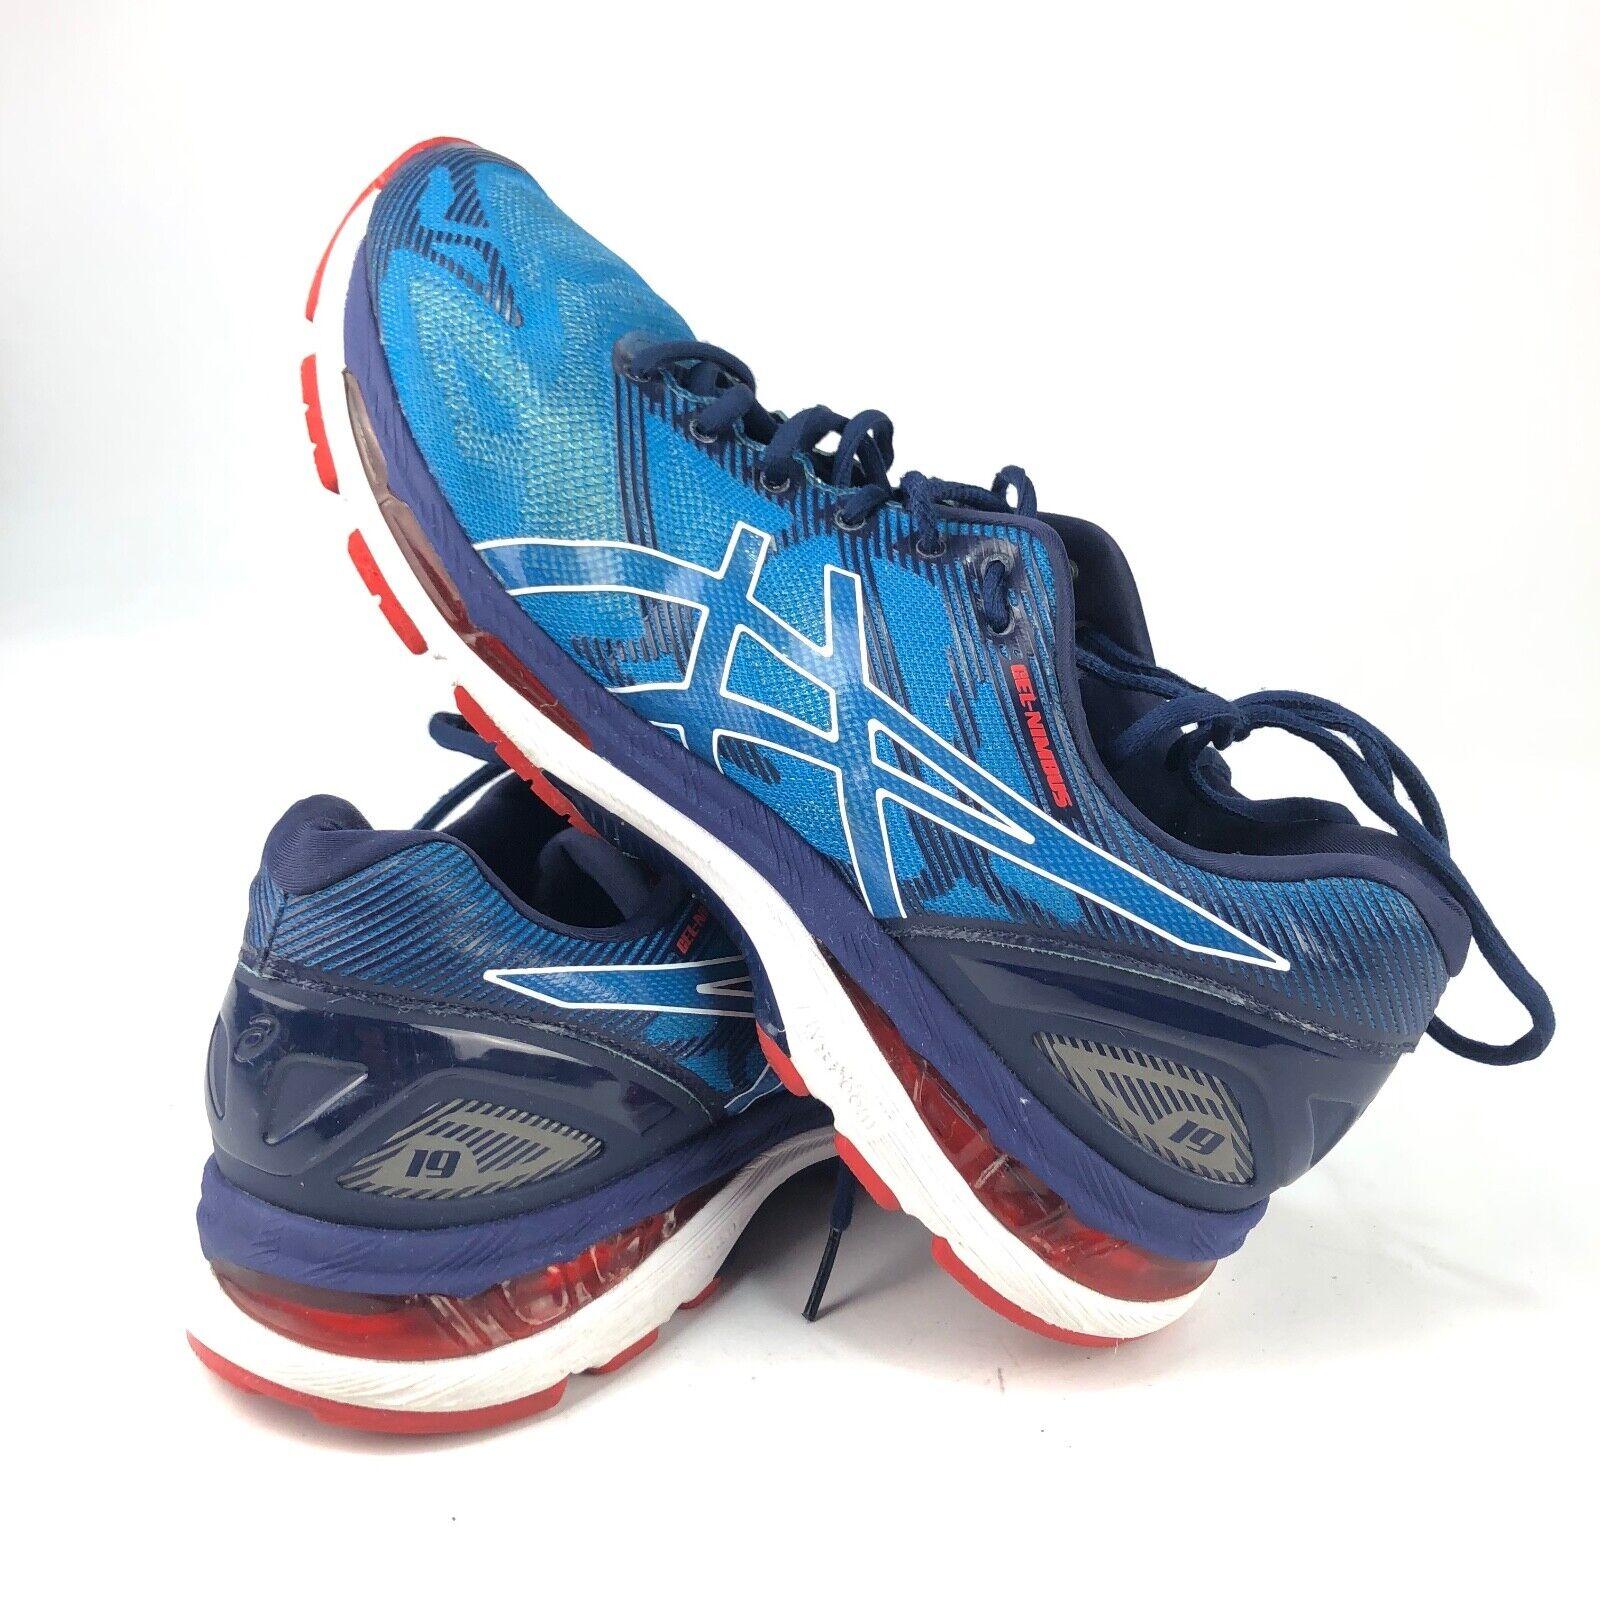 Asics Gel-Nimbus 19 zapatos atléticos para hombre Talla 11.5 Azul blancoo Indigo T700N